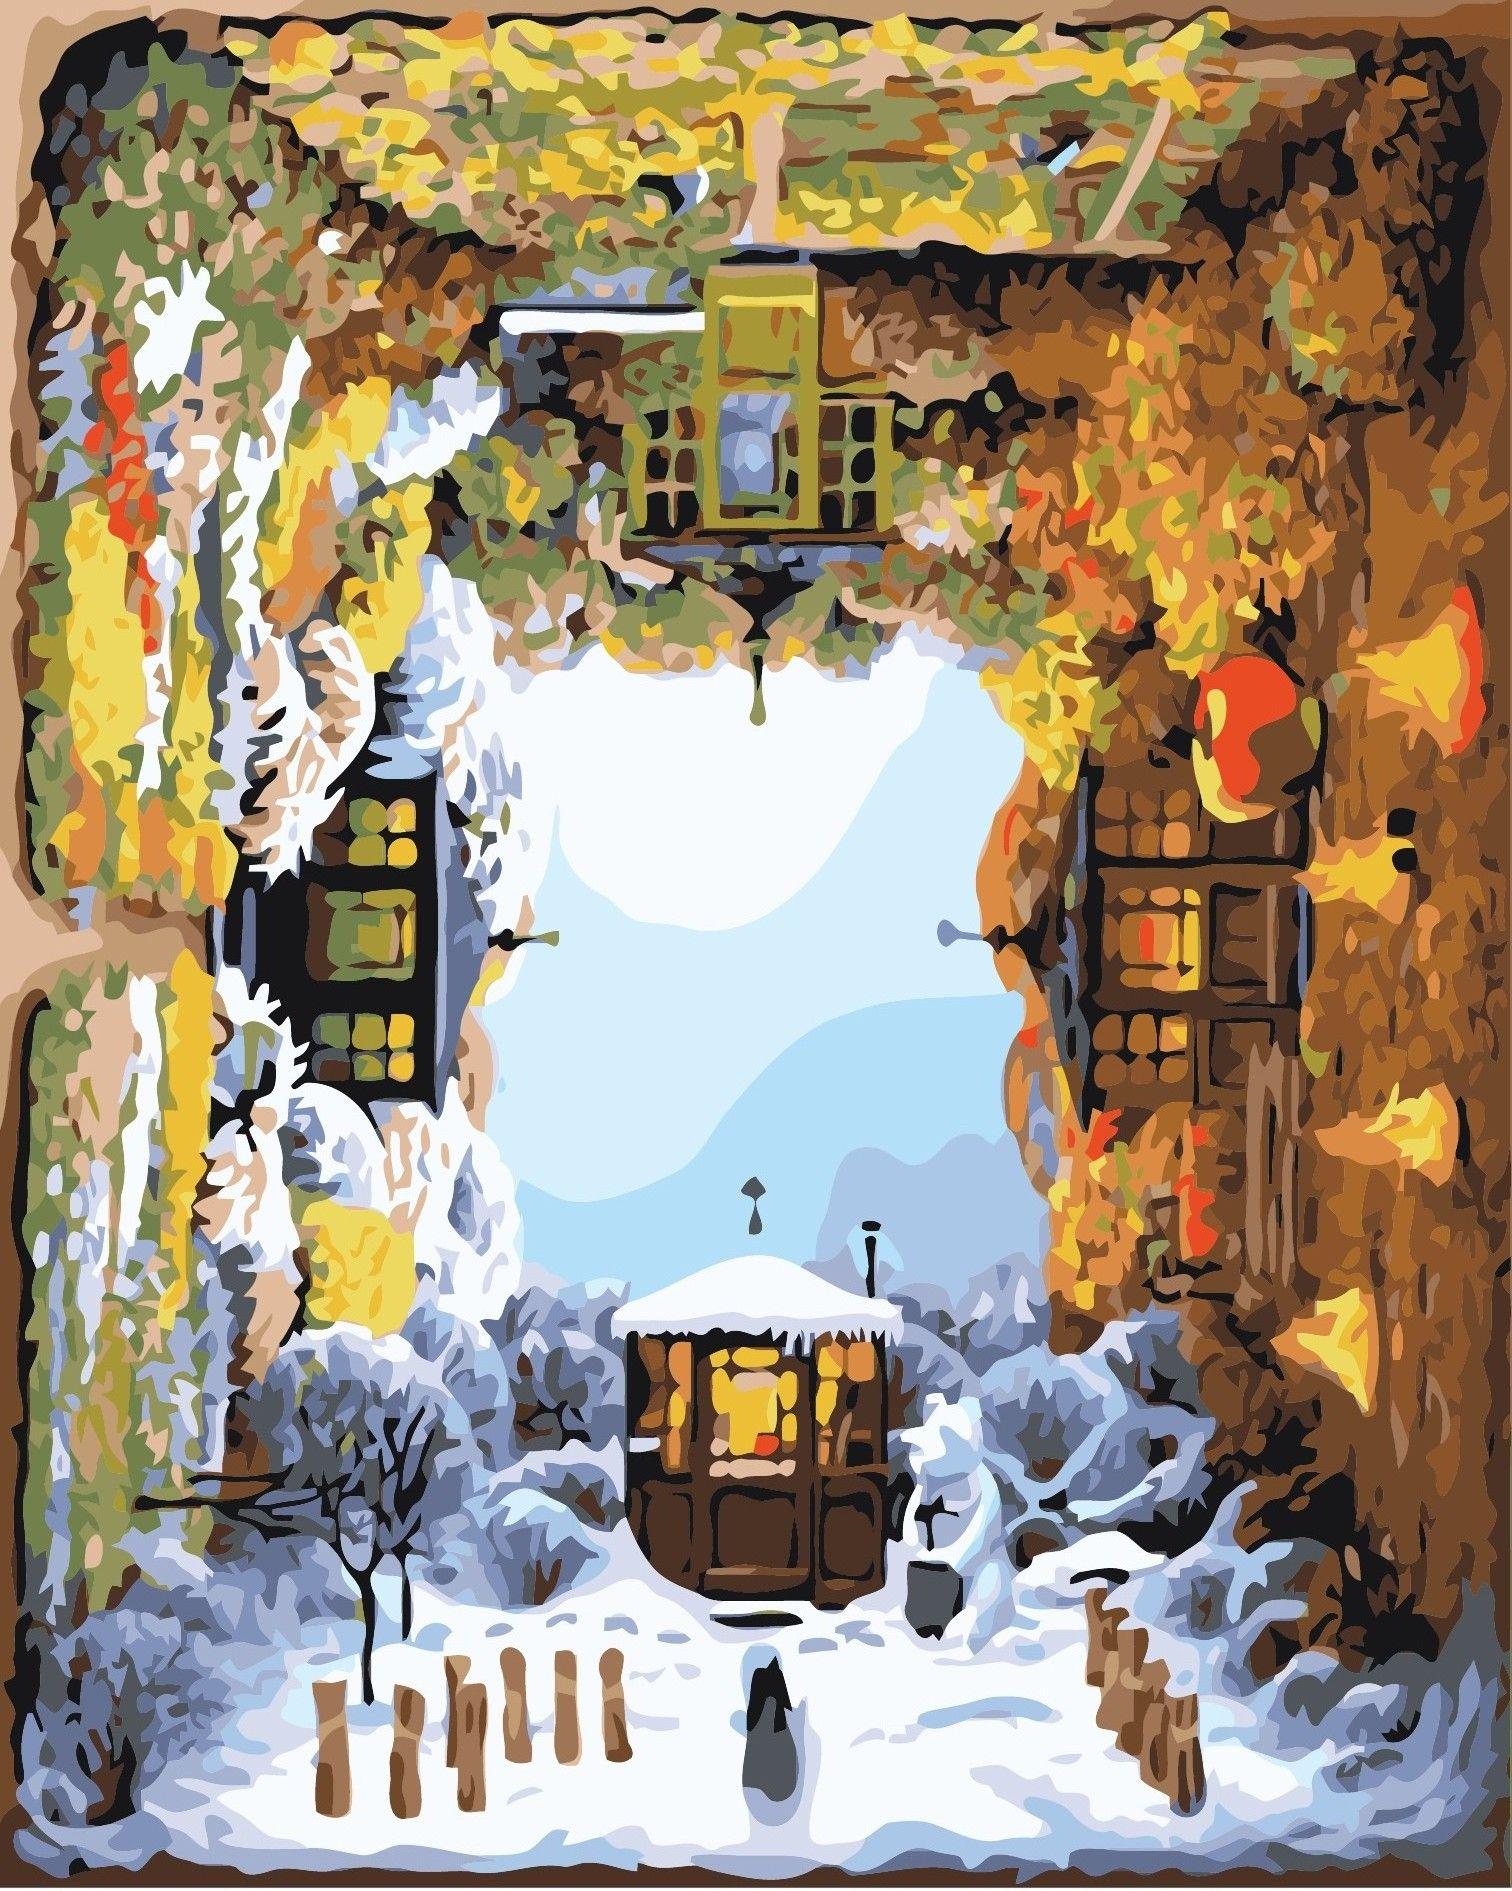 Satın Al Dört Mevsim Rotasyon 16x20 Inç Diy Boya Tuval üzerine